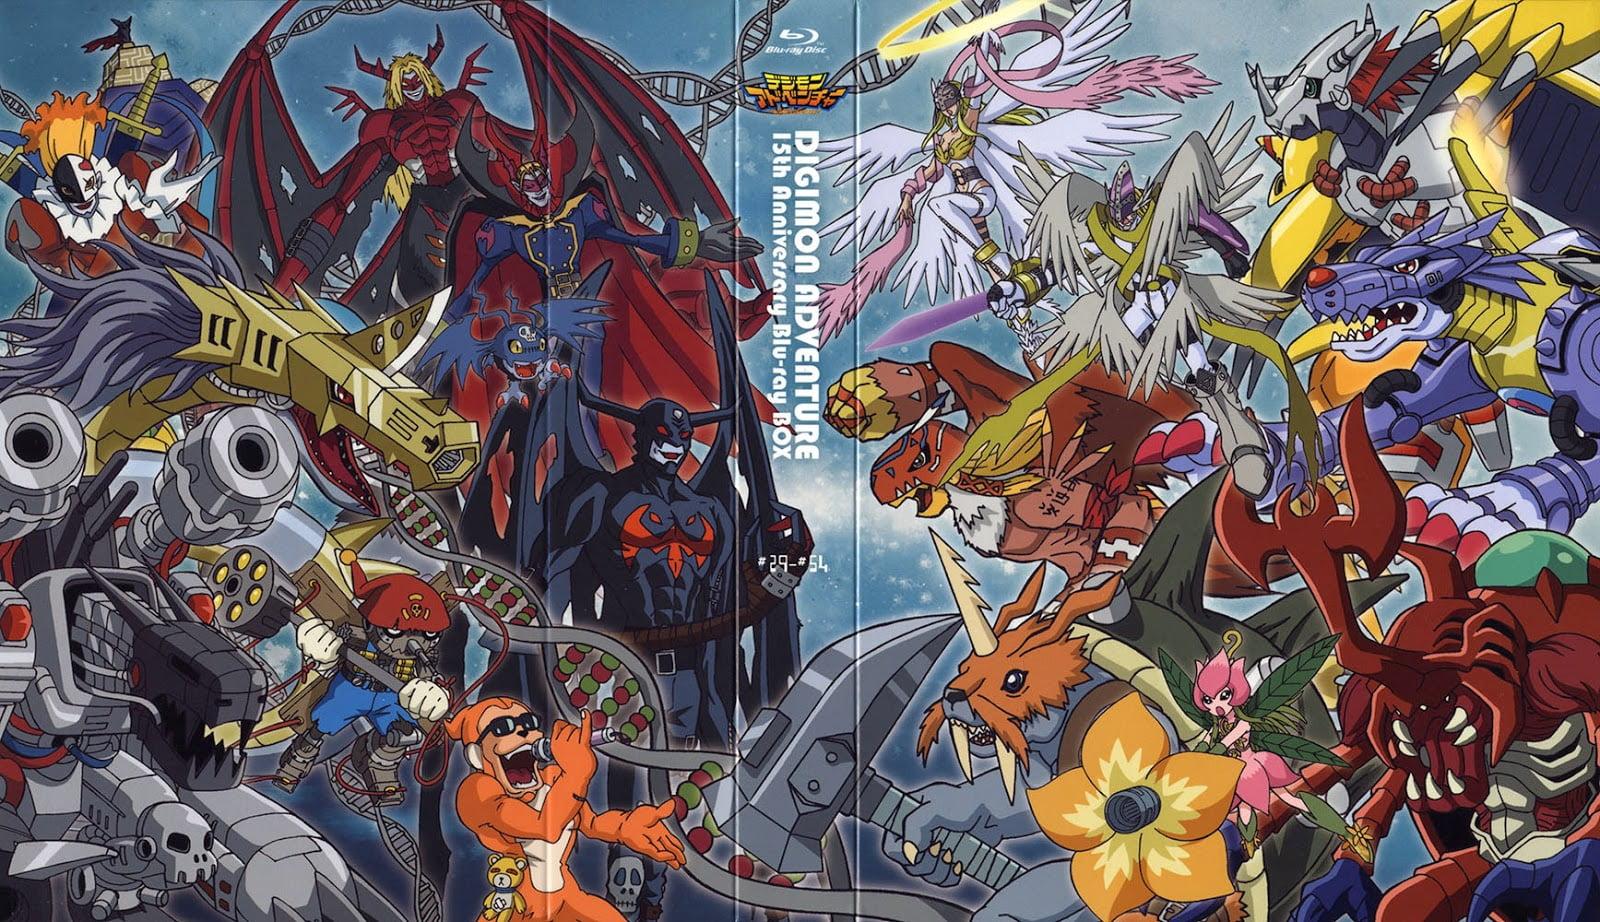 Digimon Adventure The Movie ดิจิมอนแอดเวนเจอร์ เดอะมูฟวี่ 7 [พากย์ไทย]